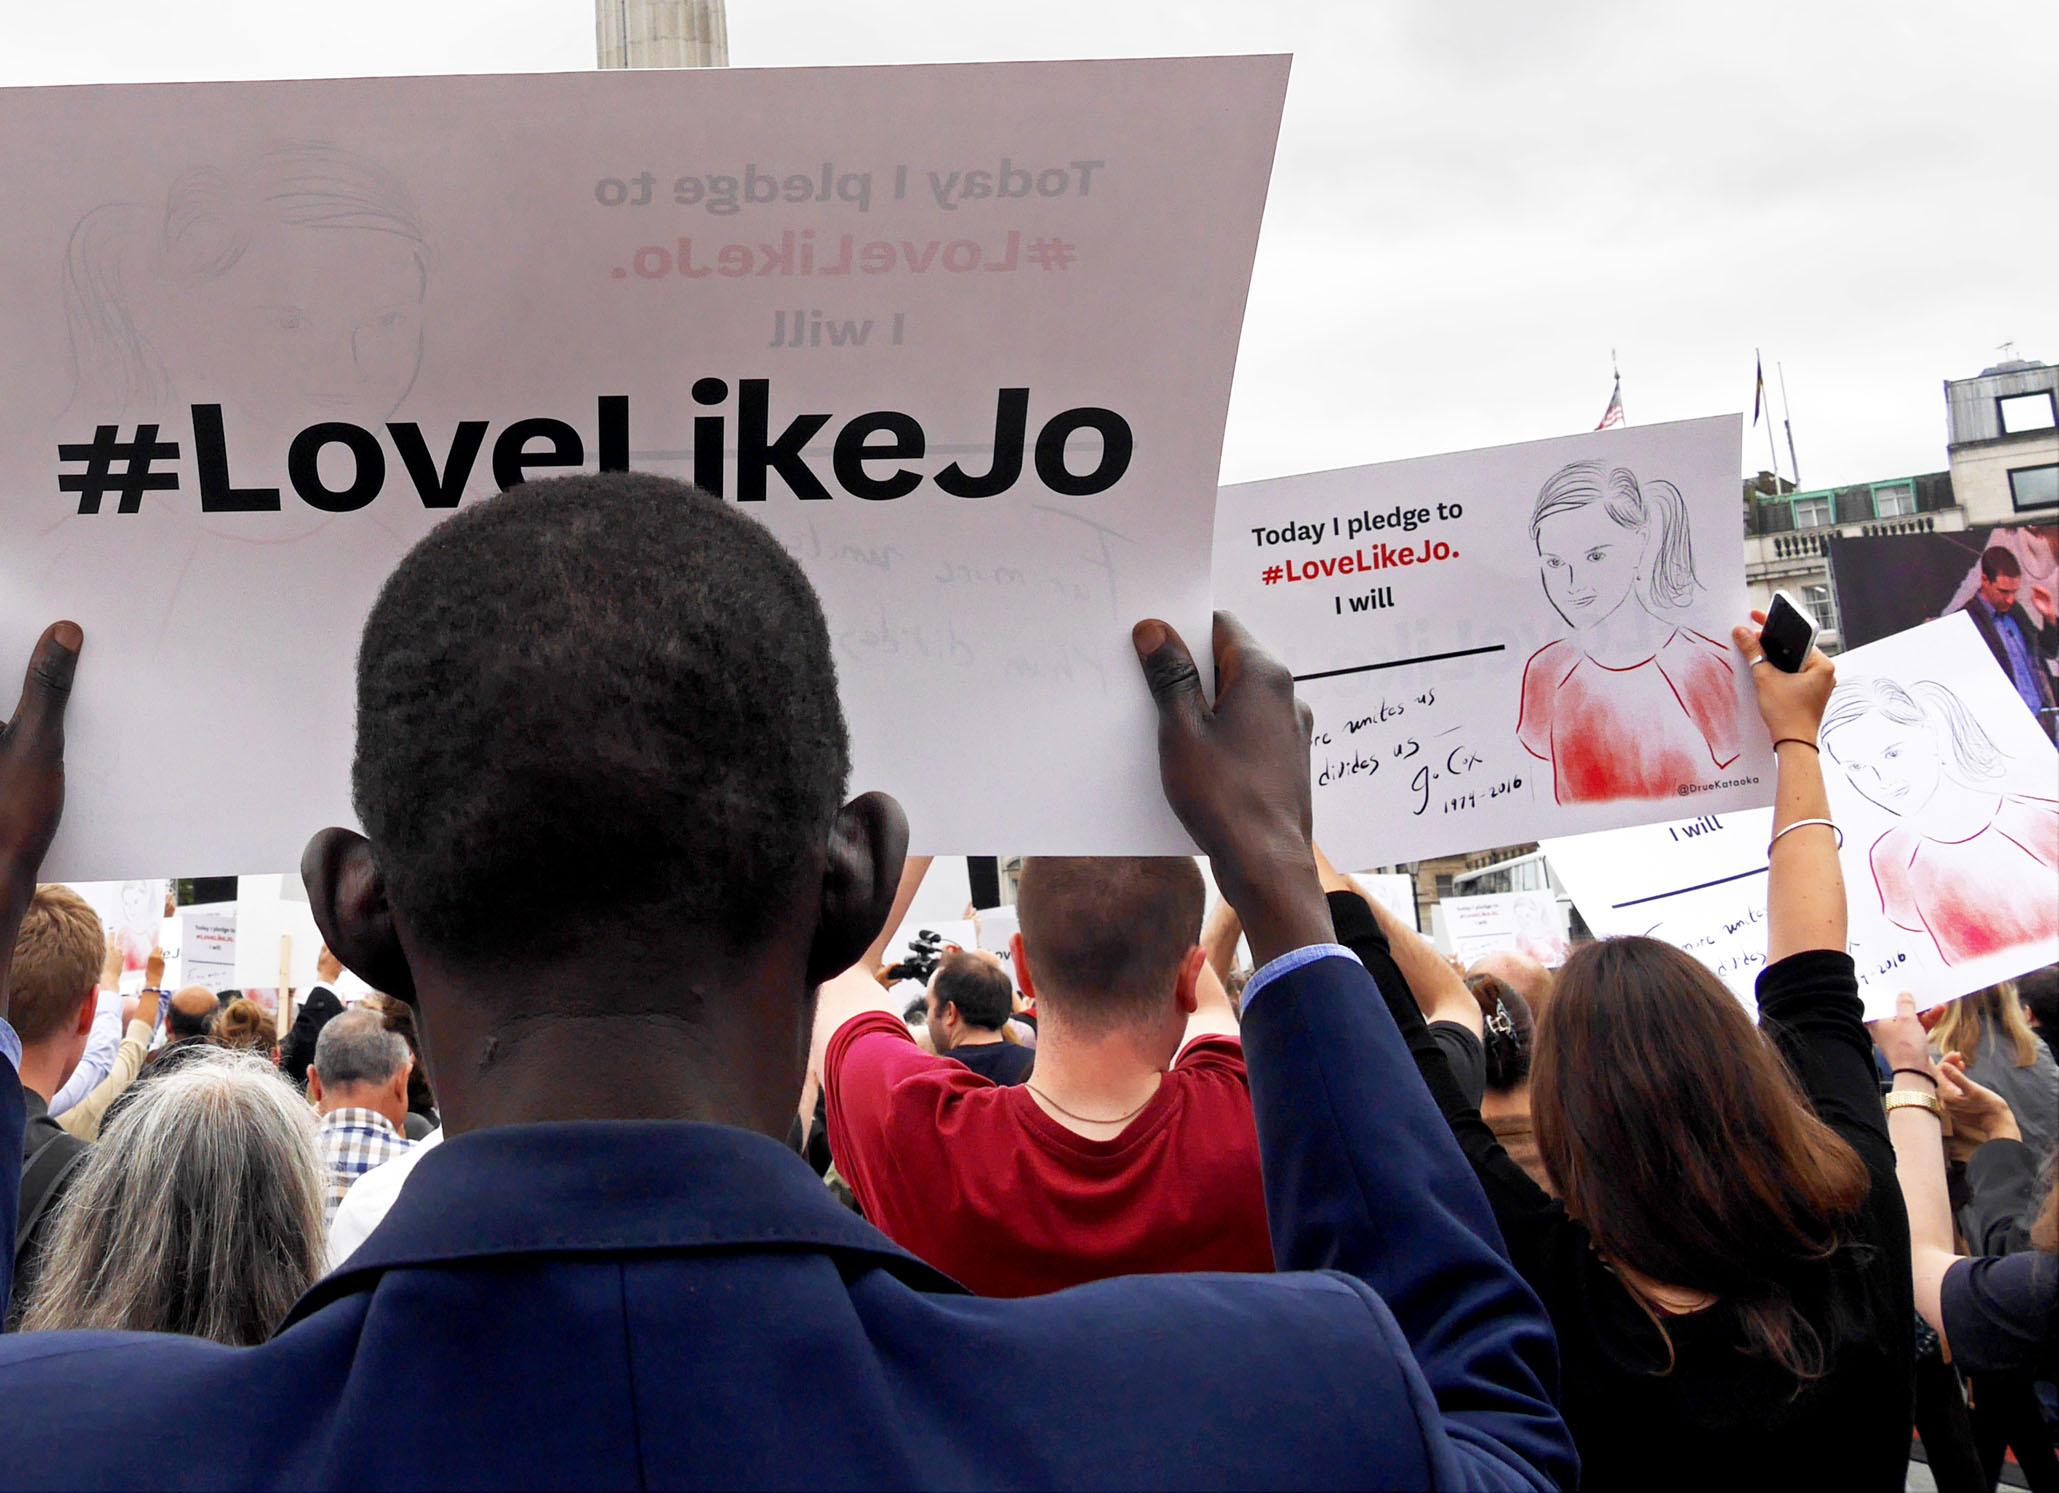 Remembering Jo Cox - Trafalgar Square https://flic.kr/p/JniaBf